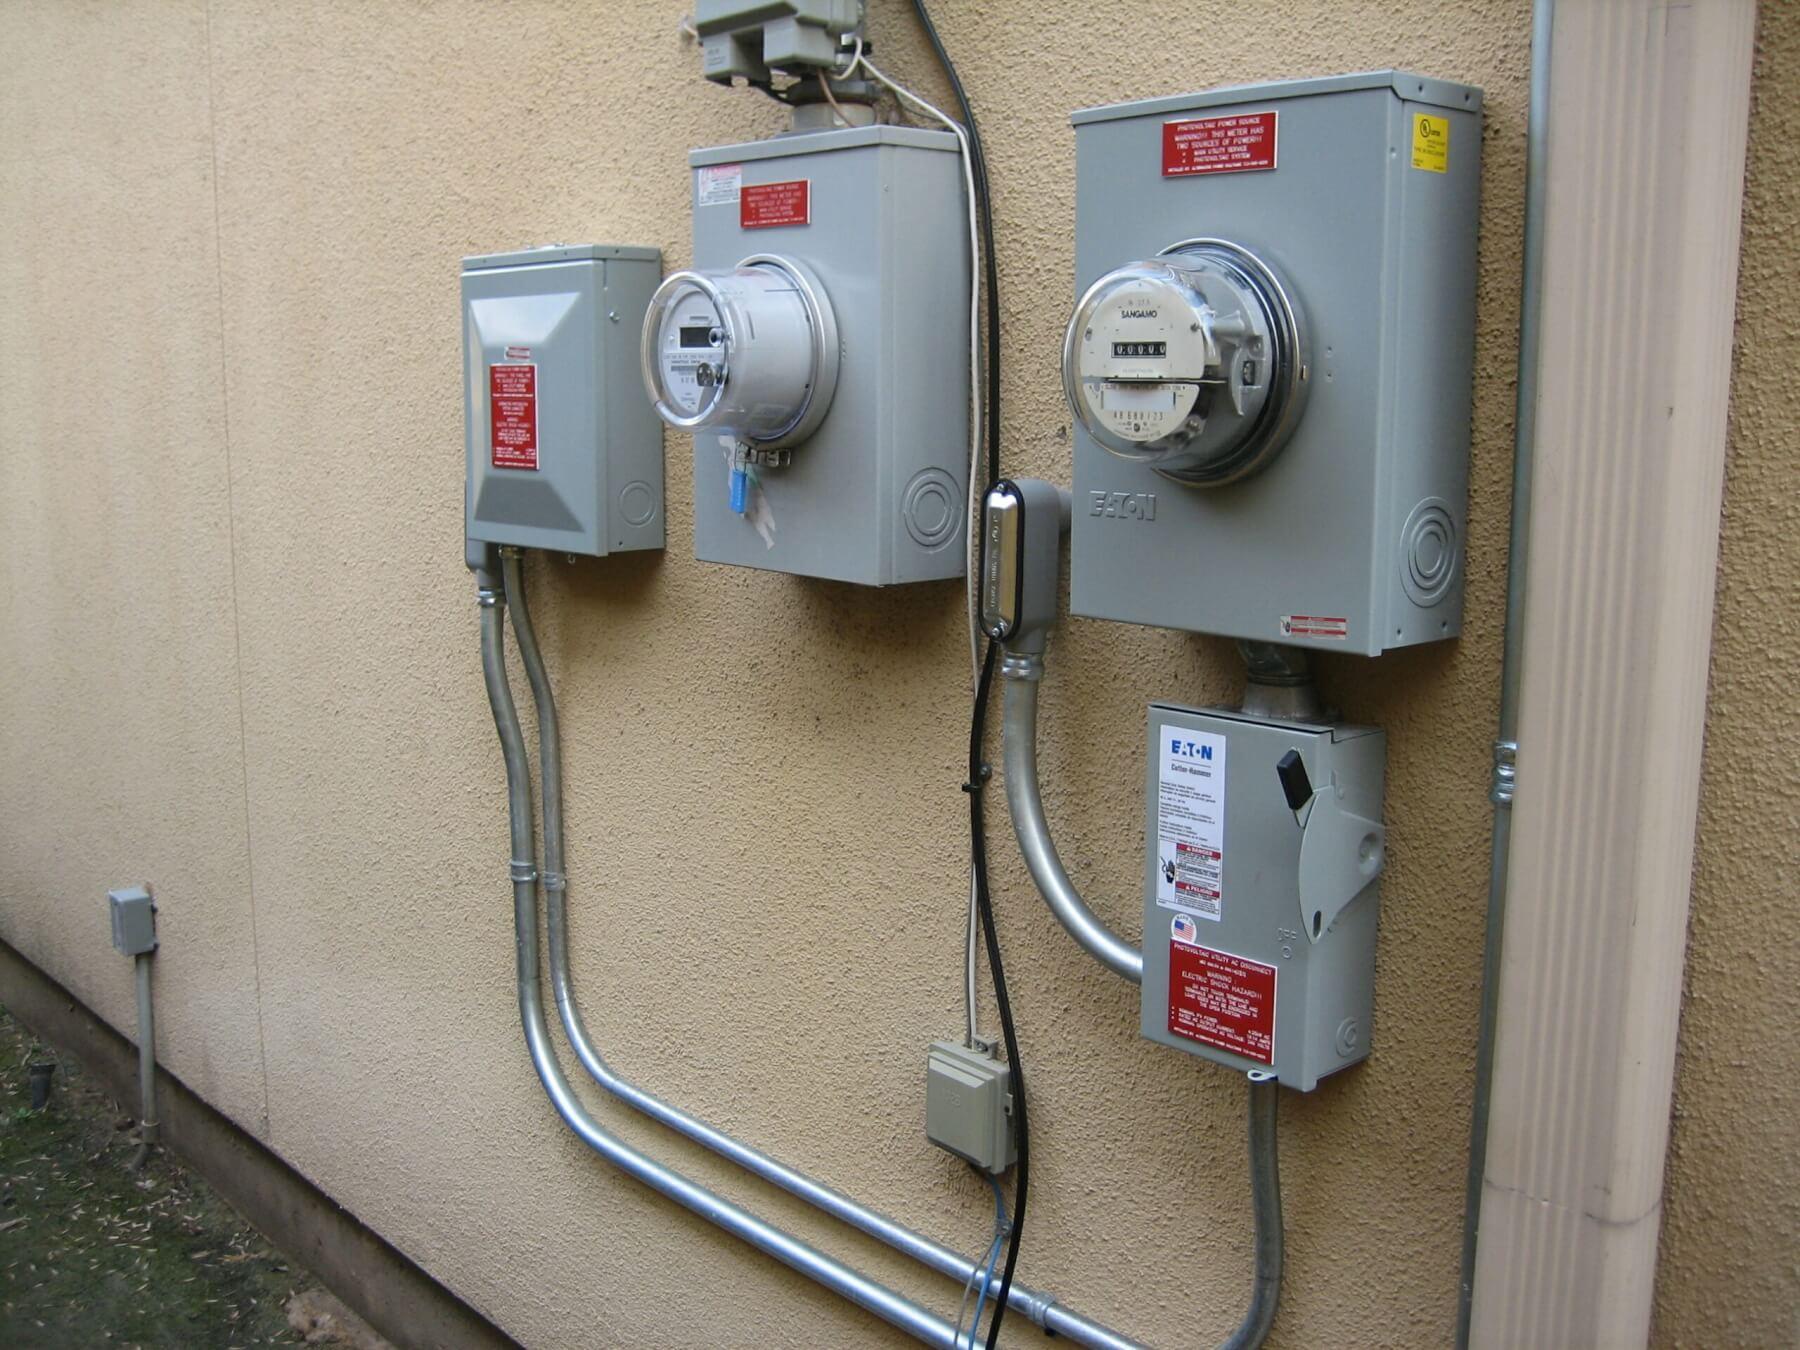 Solar panel utility meters